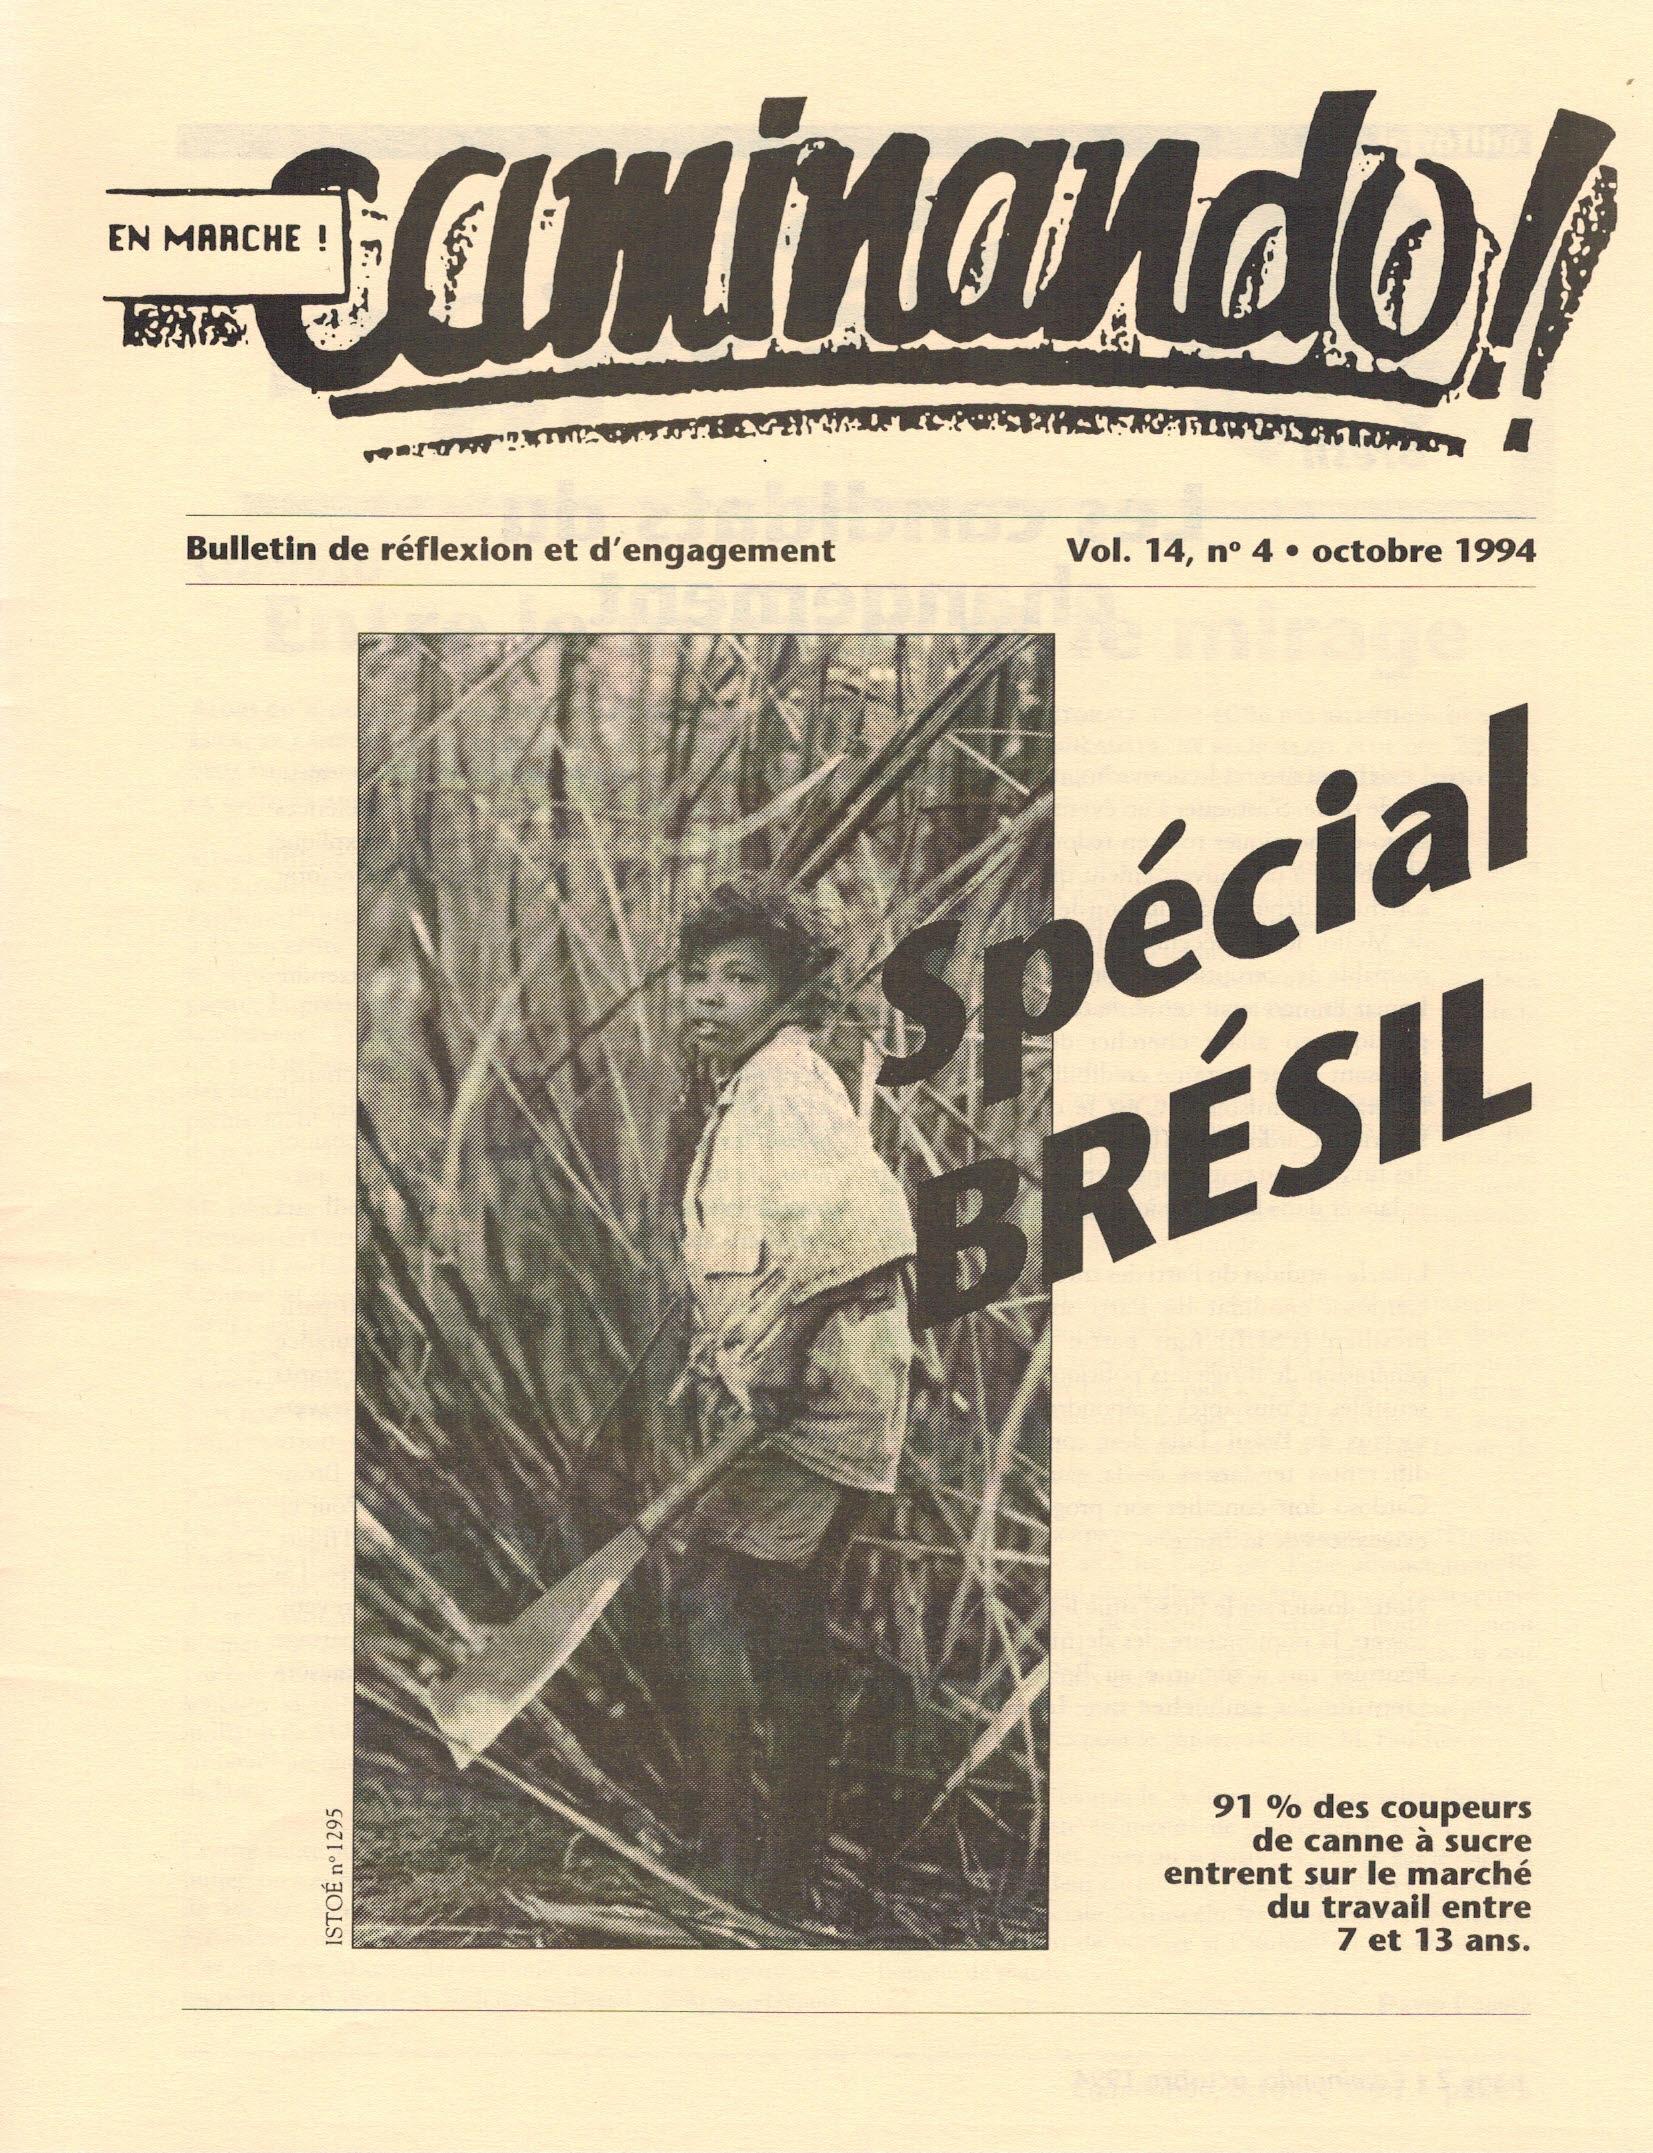 Caminando-vol14-No4-octobre1994_couverture